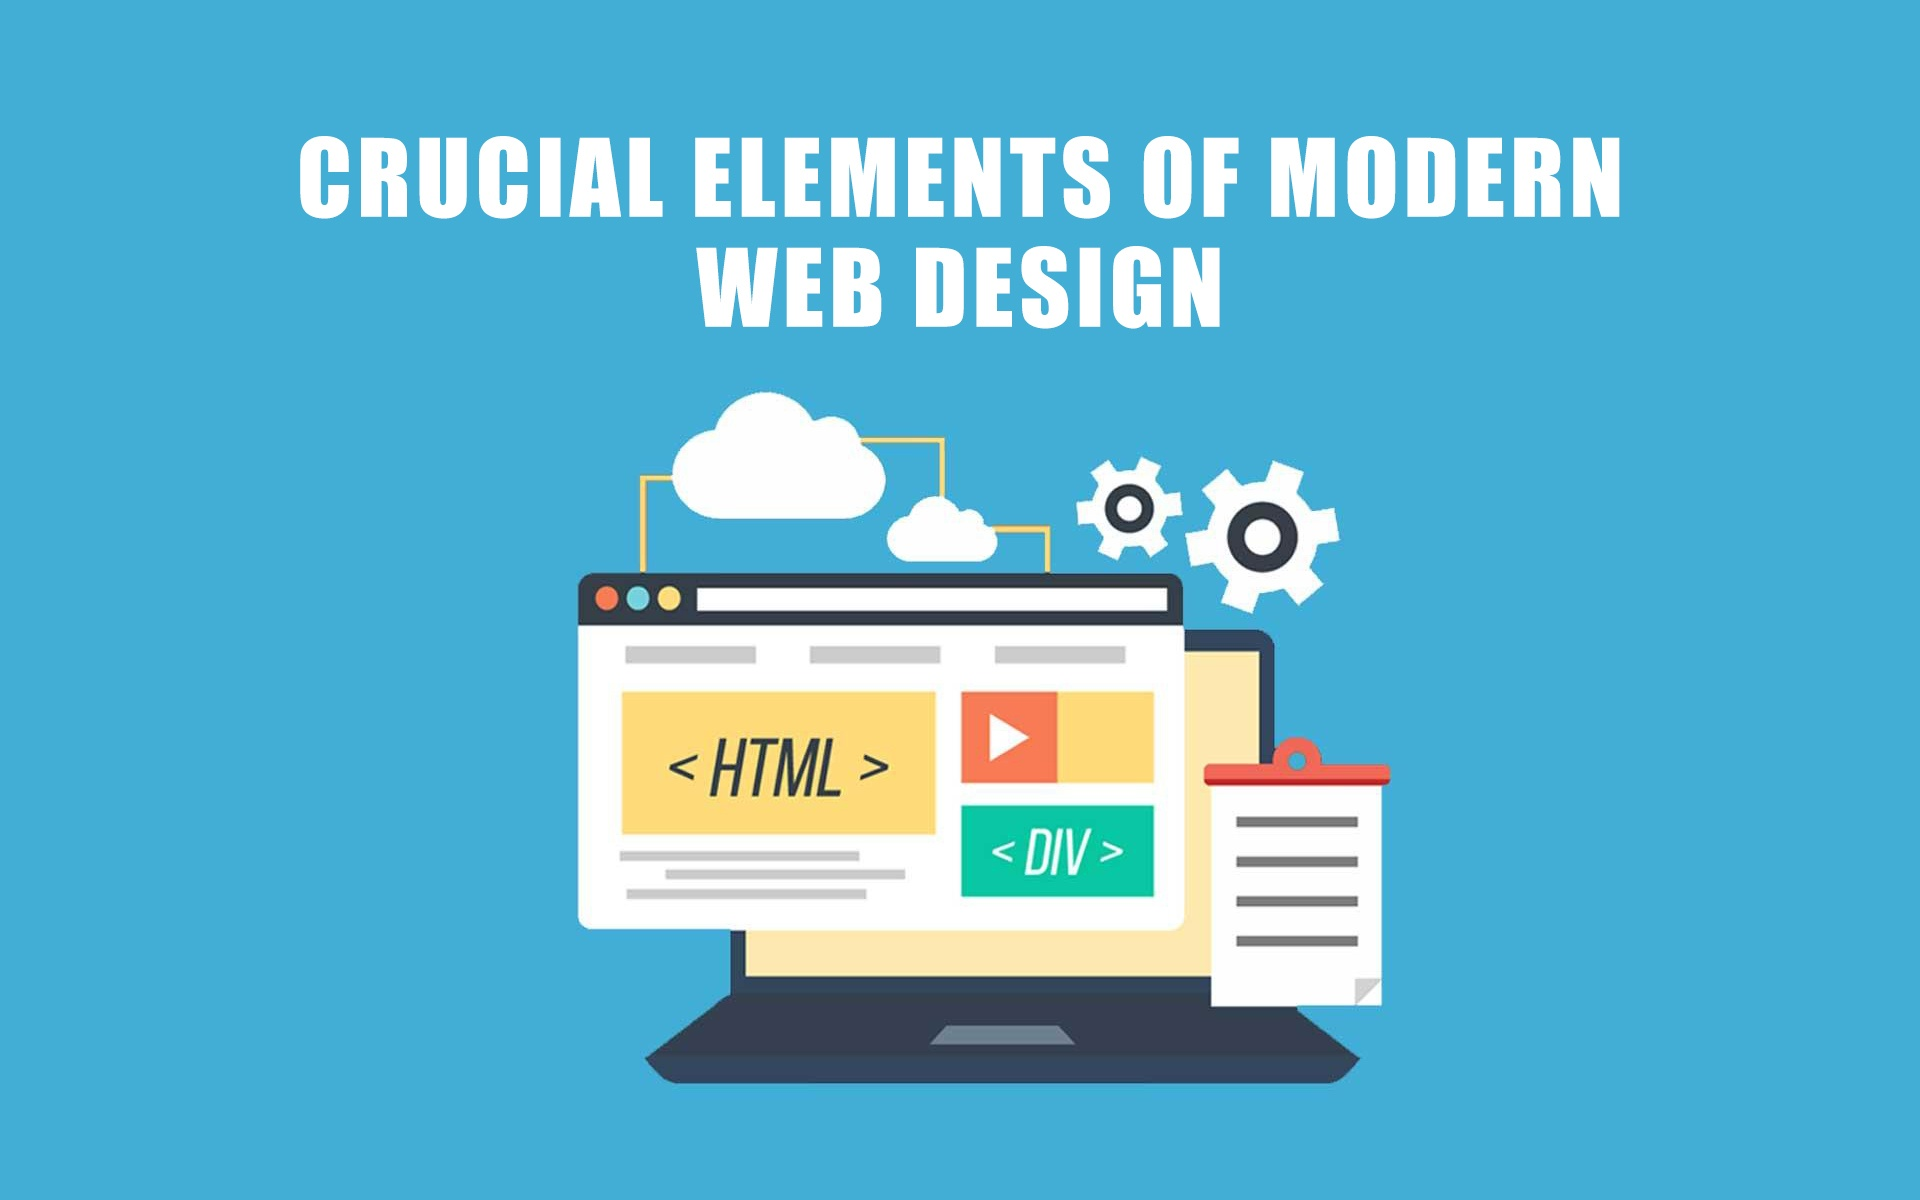 Crucial Elements of Modern Web Design